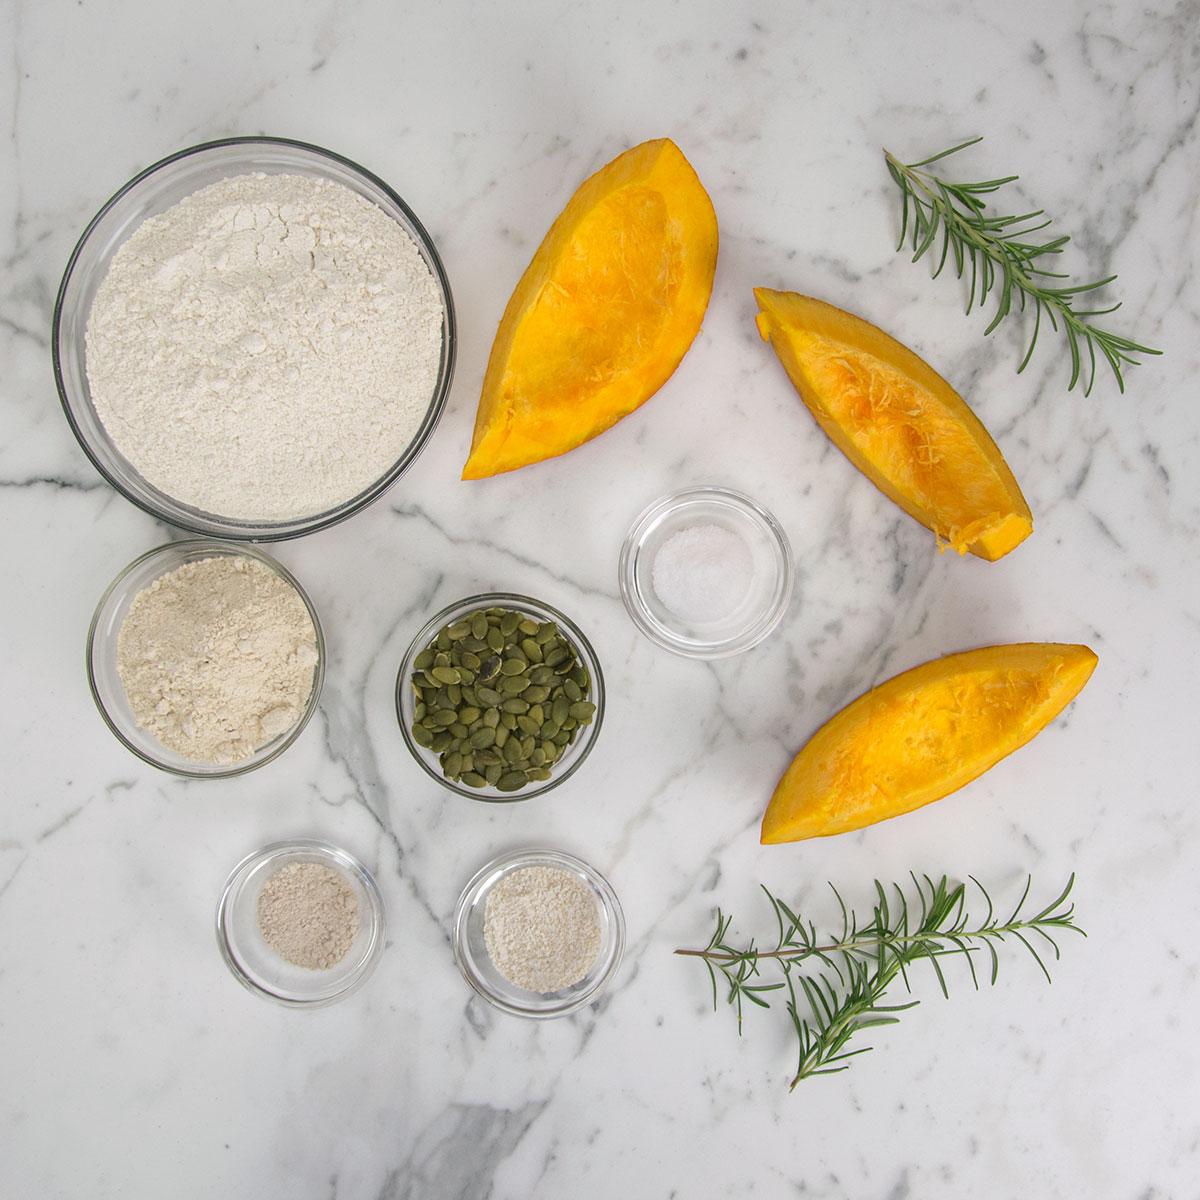 pane_alla_zucca_ingredienti